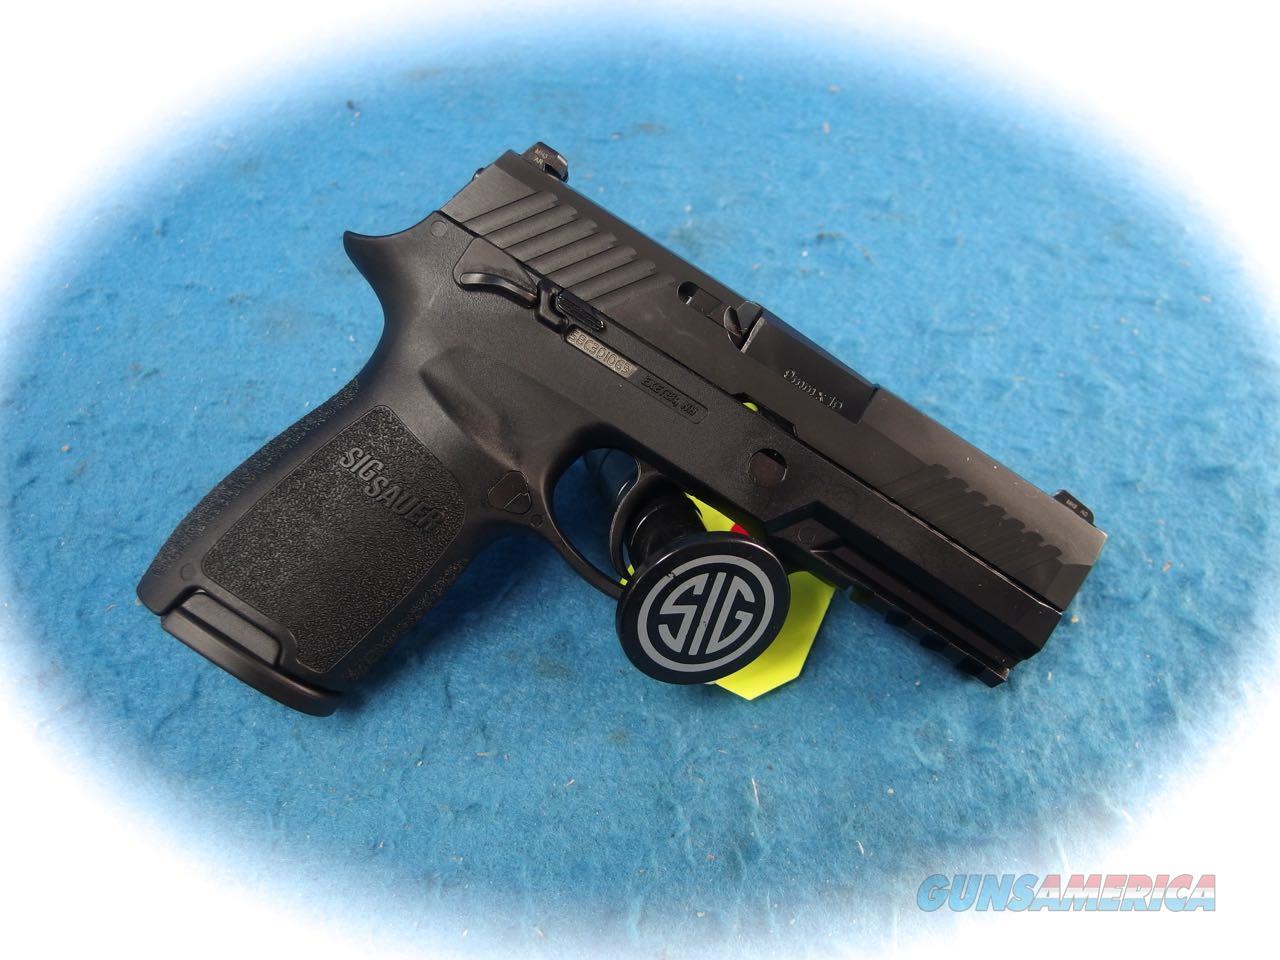 Sig Sauer P320C Nitron Compact 9mm Pistol Model 320C-9-BSS-MS **New**  Guns > Pistols > Sig - Sauer/Sigarms Pistols > P320